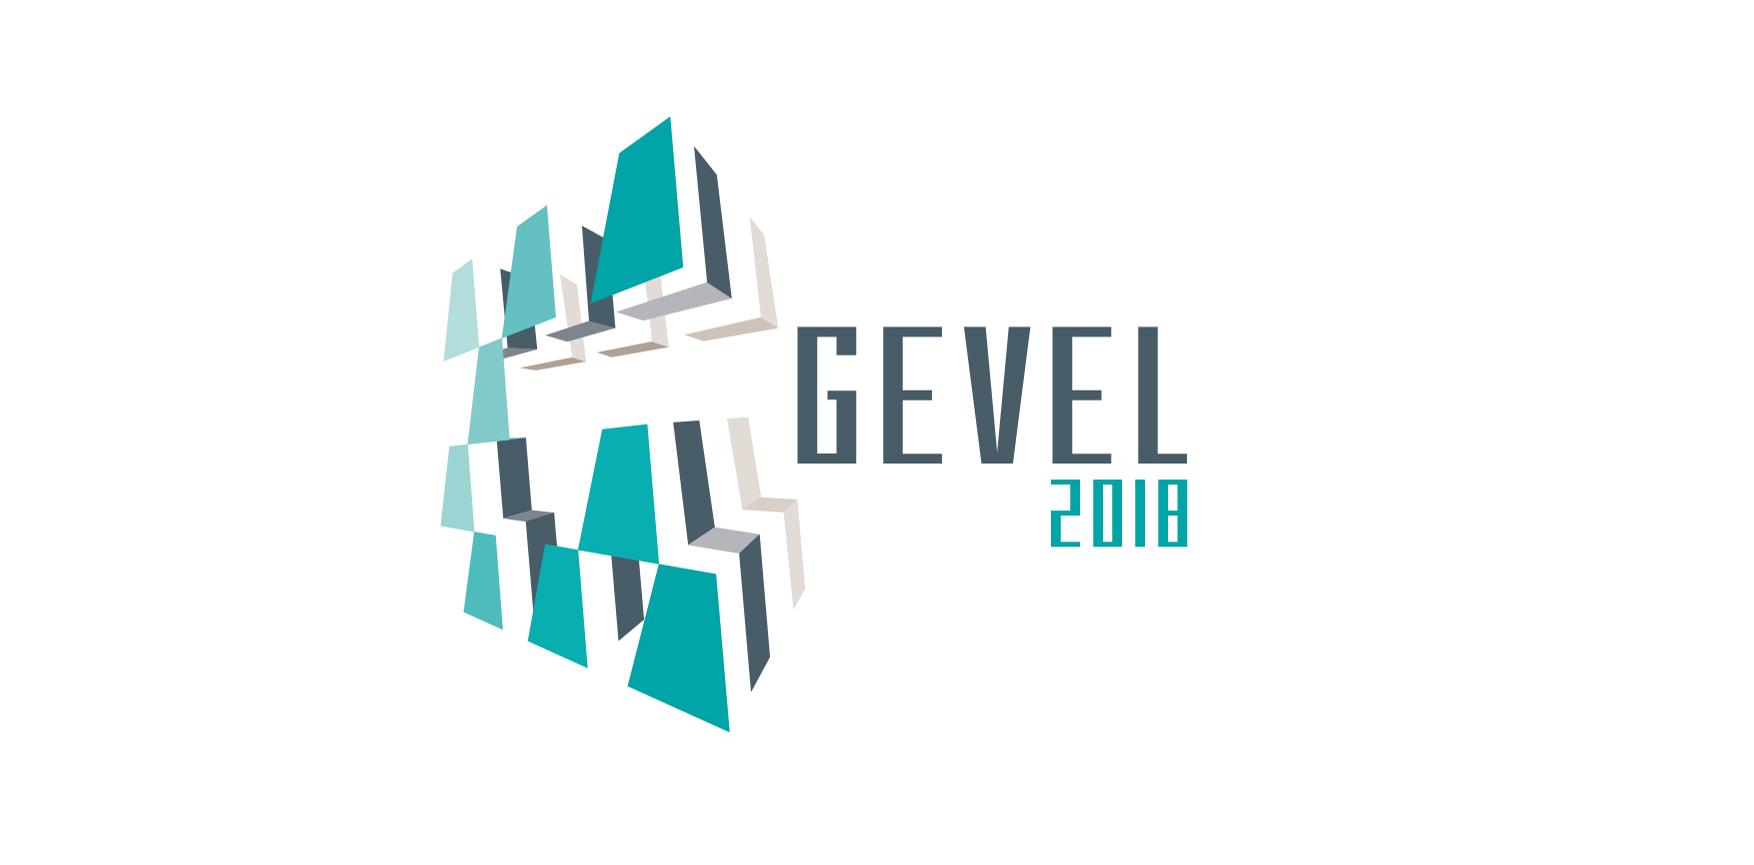 MBS Gevel 2018